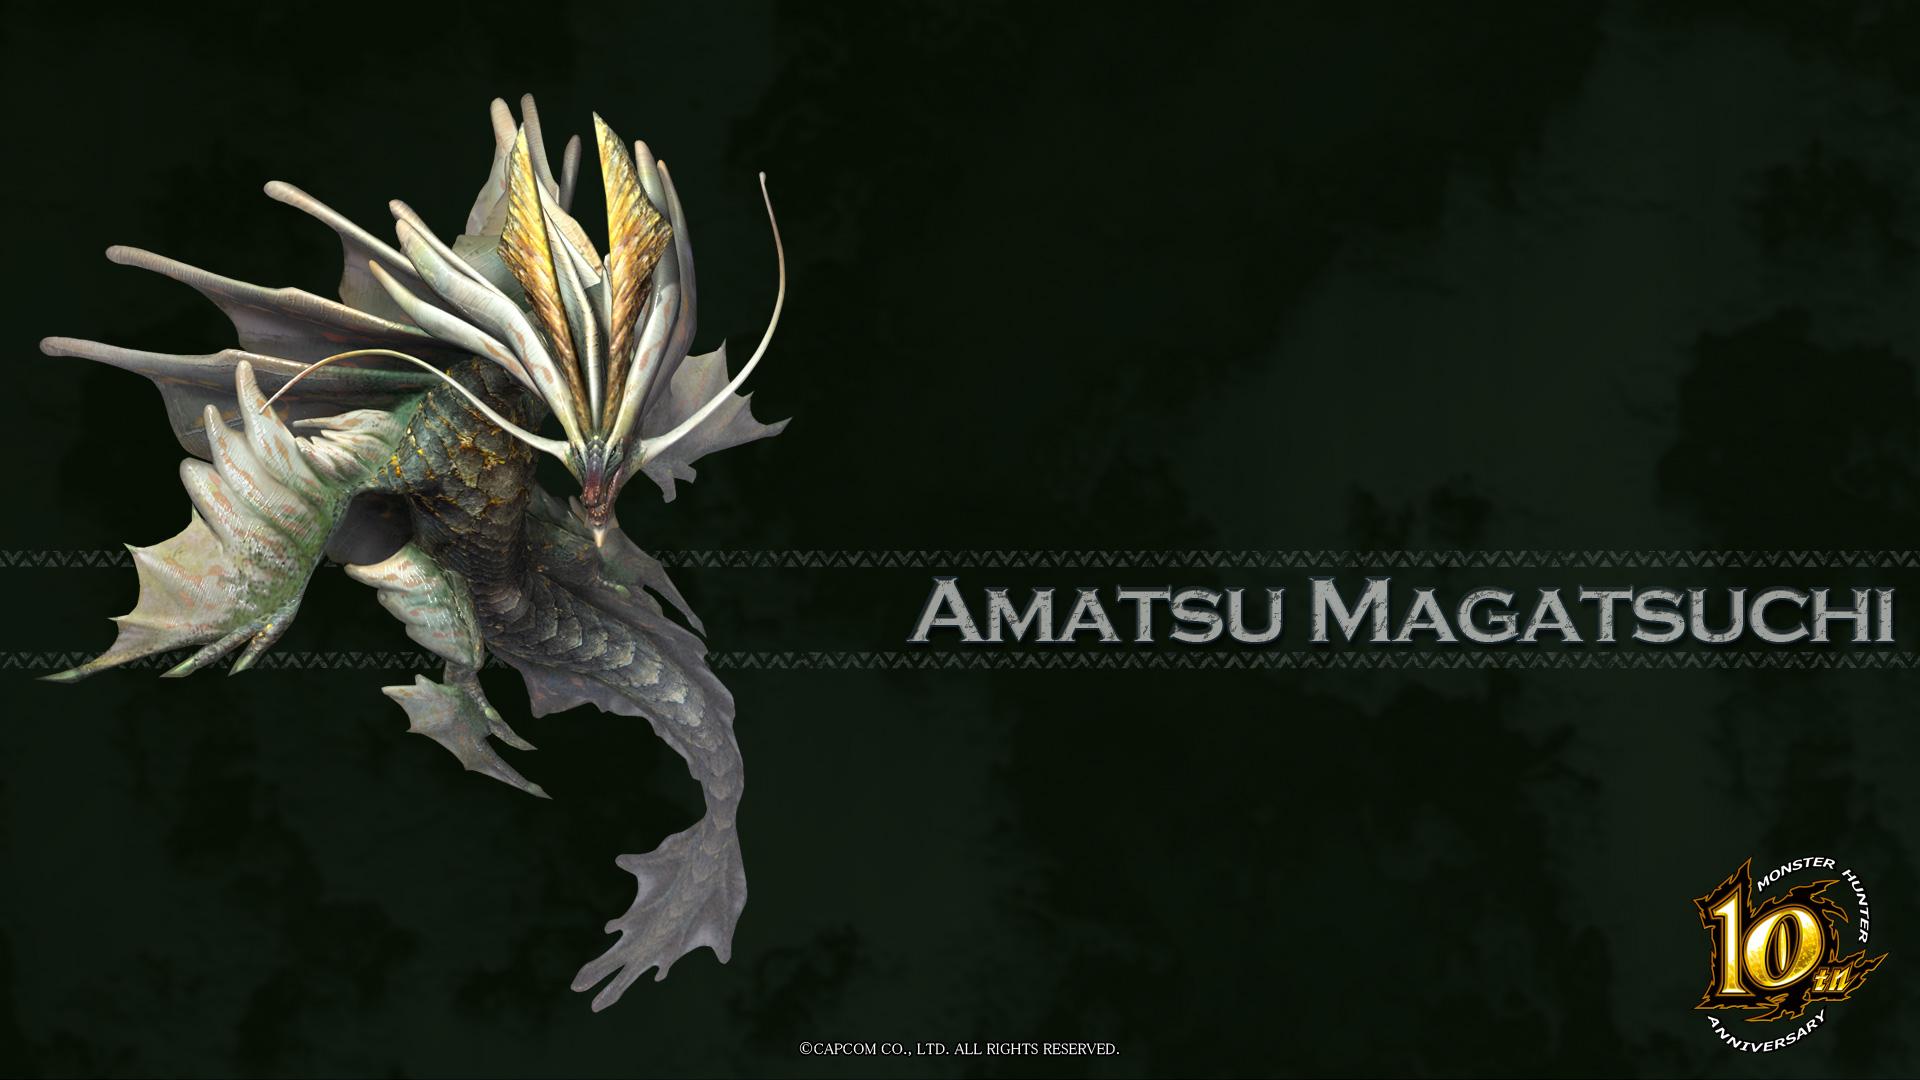 MH 10th Anniversary-Amatsumagatsuchi Wallpaper 001